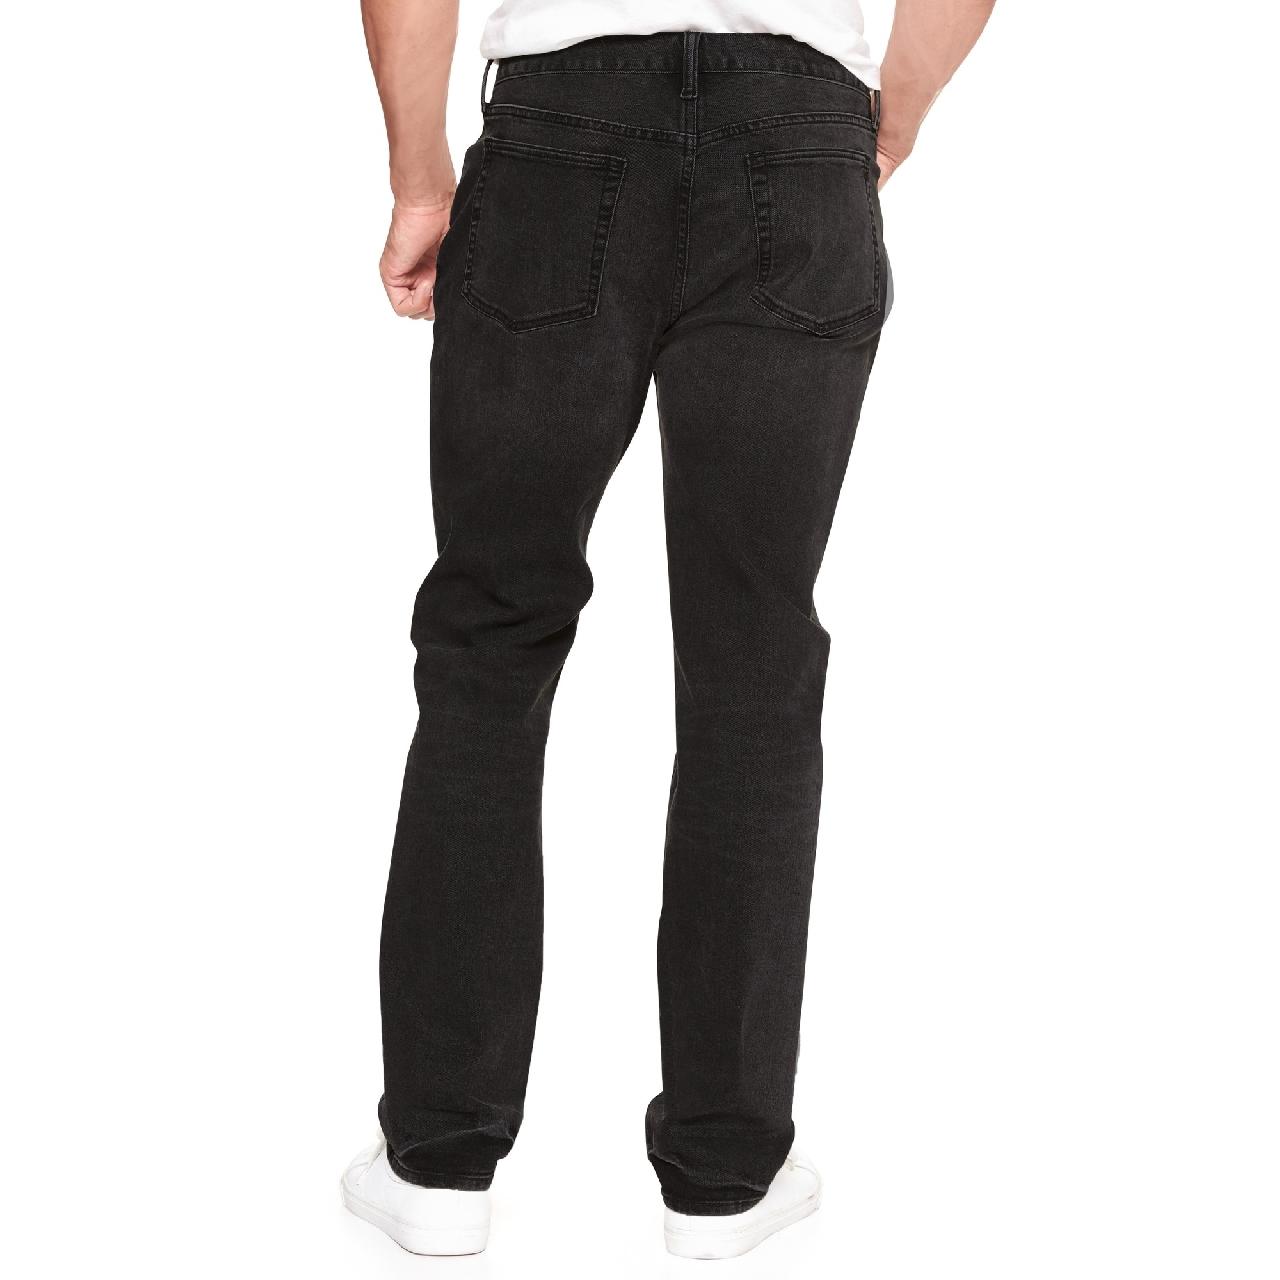 Gap男装 时尚舒适弹力修身牛仔裤868573 E 春装